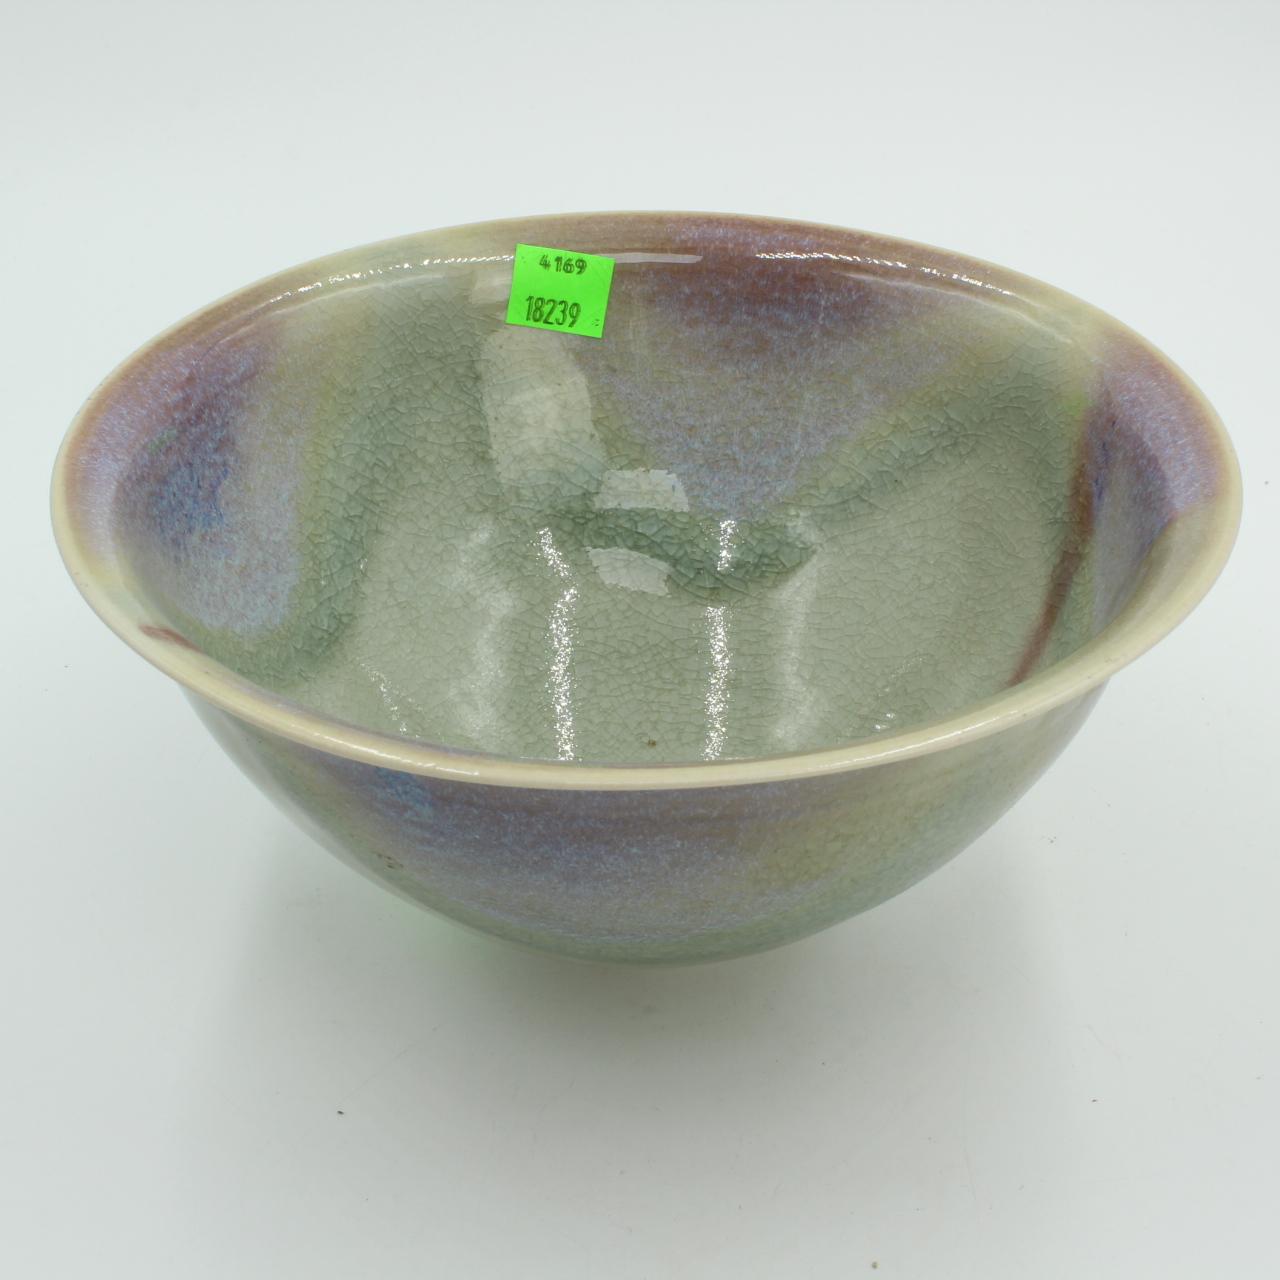 Vintage Japanese Ceramic Bowl, Large